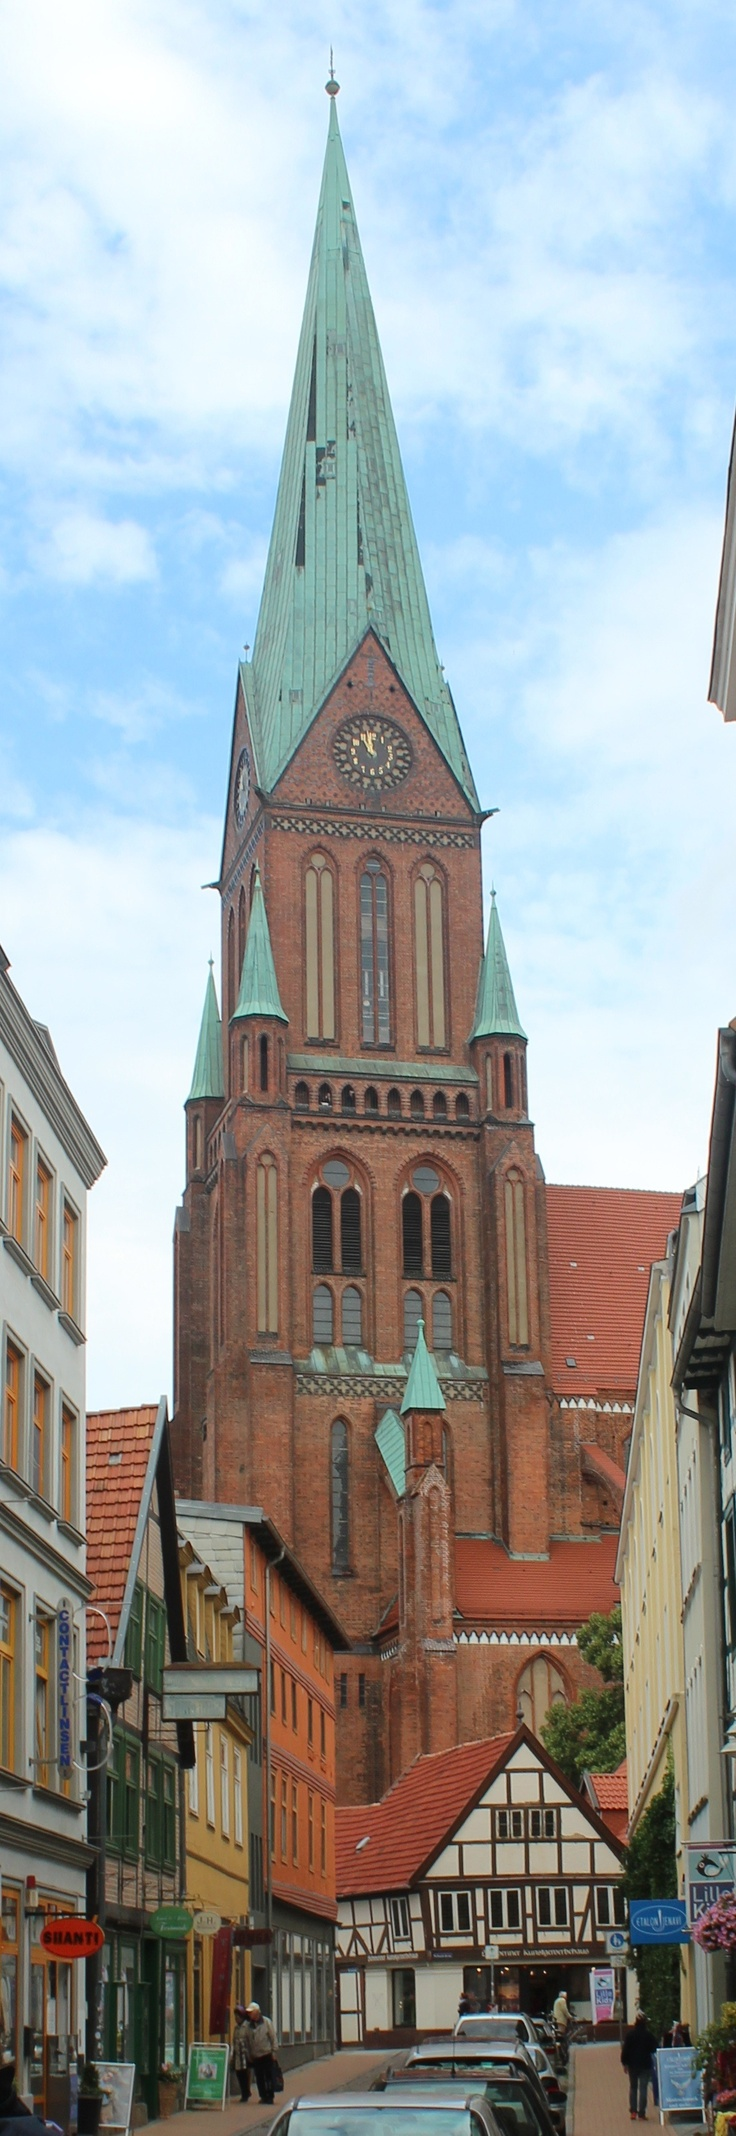 Schwerin church -NCL Cruise WARNEMUNDE PORT, GERMANY